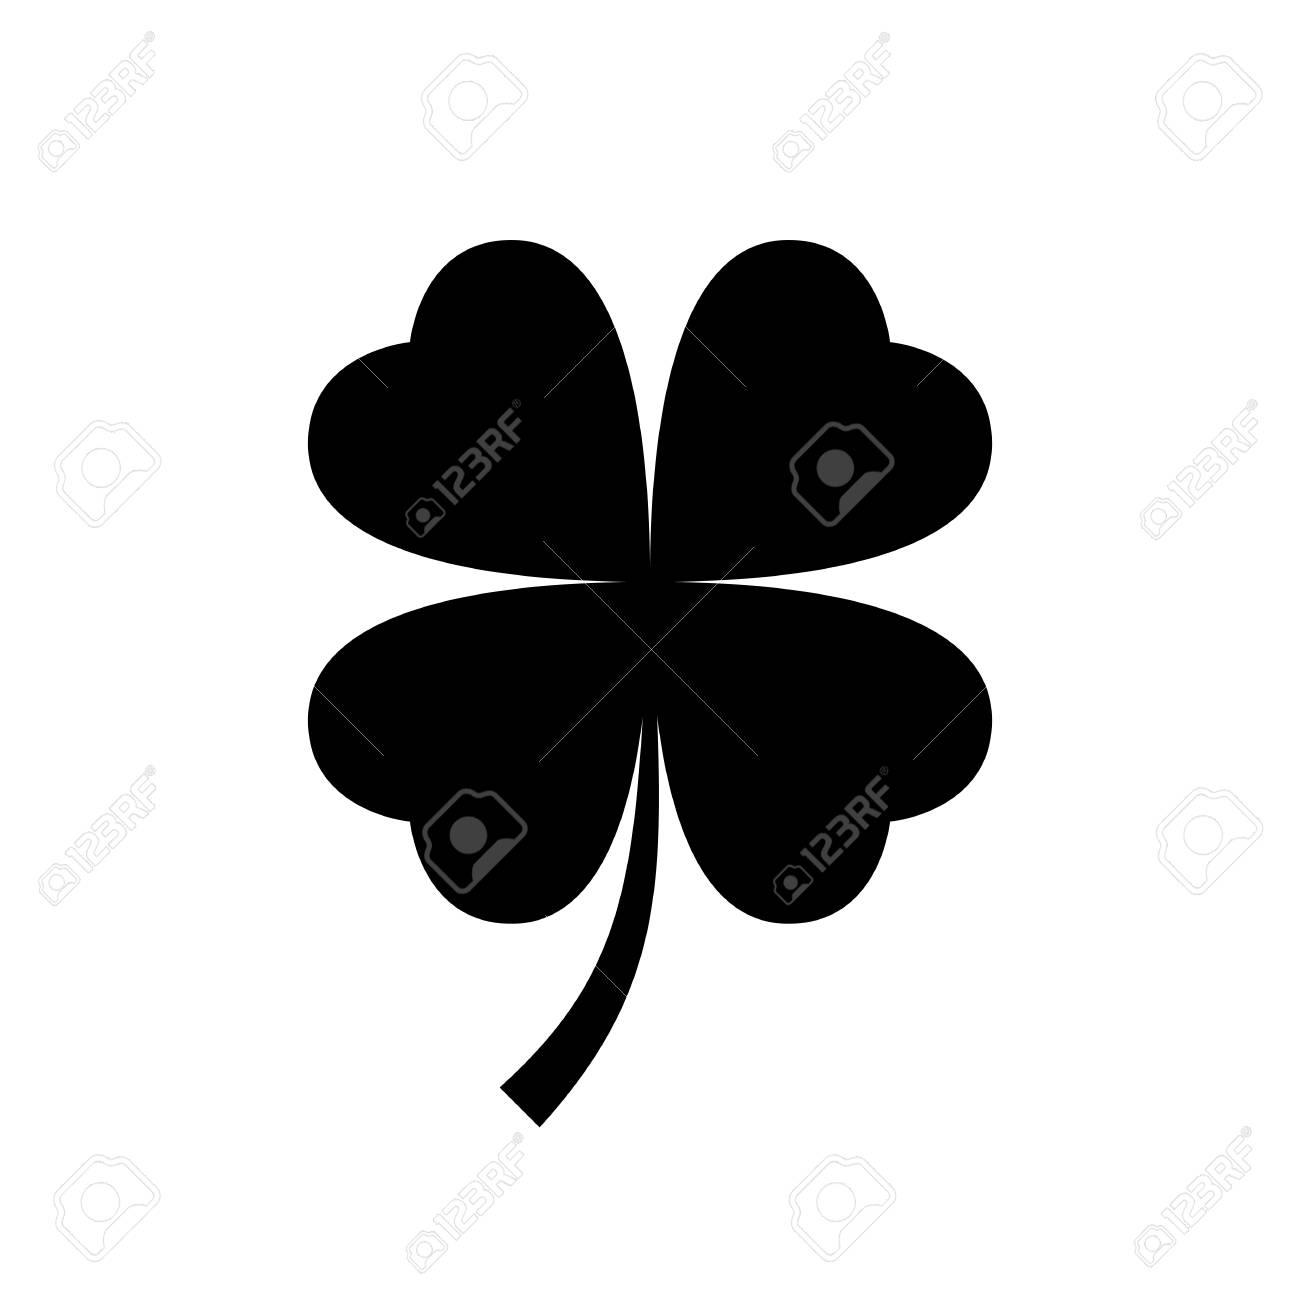 Four leaf clover icon. Black, minimalist icon isolated on white...